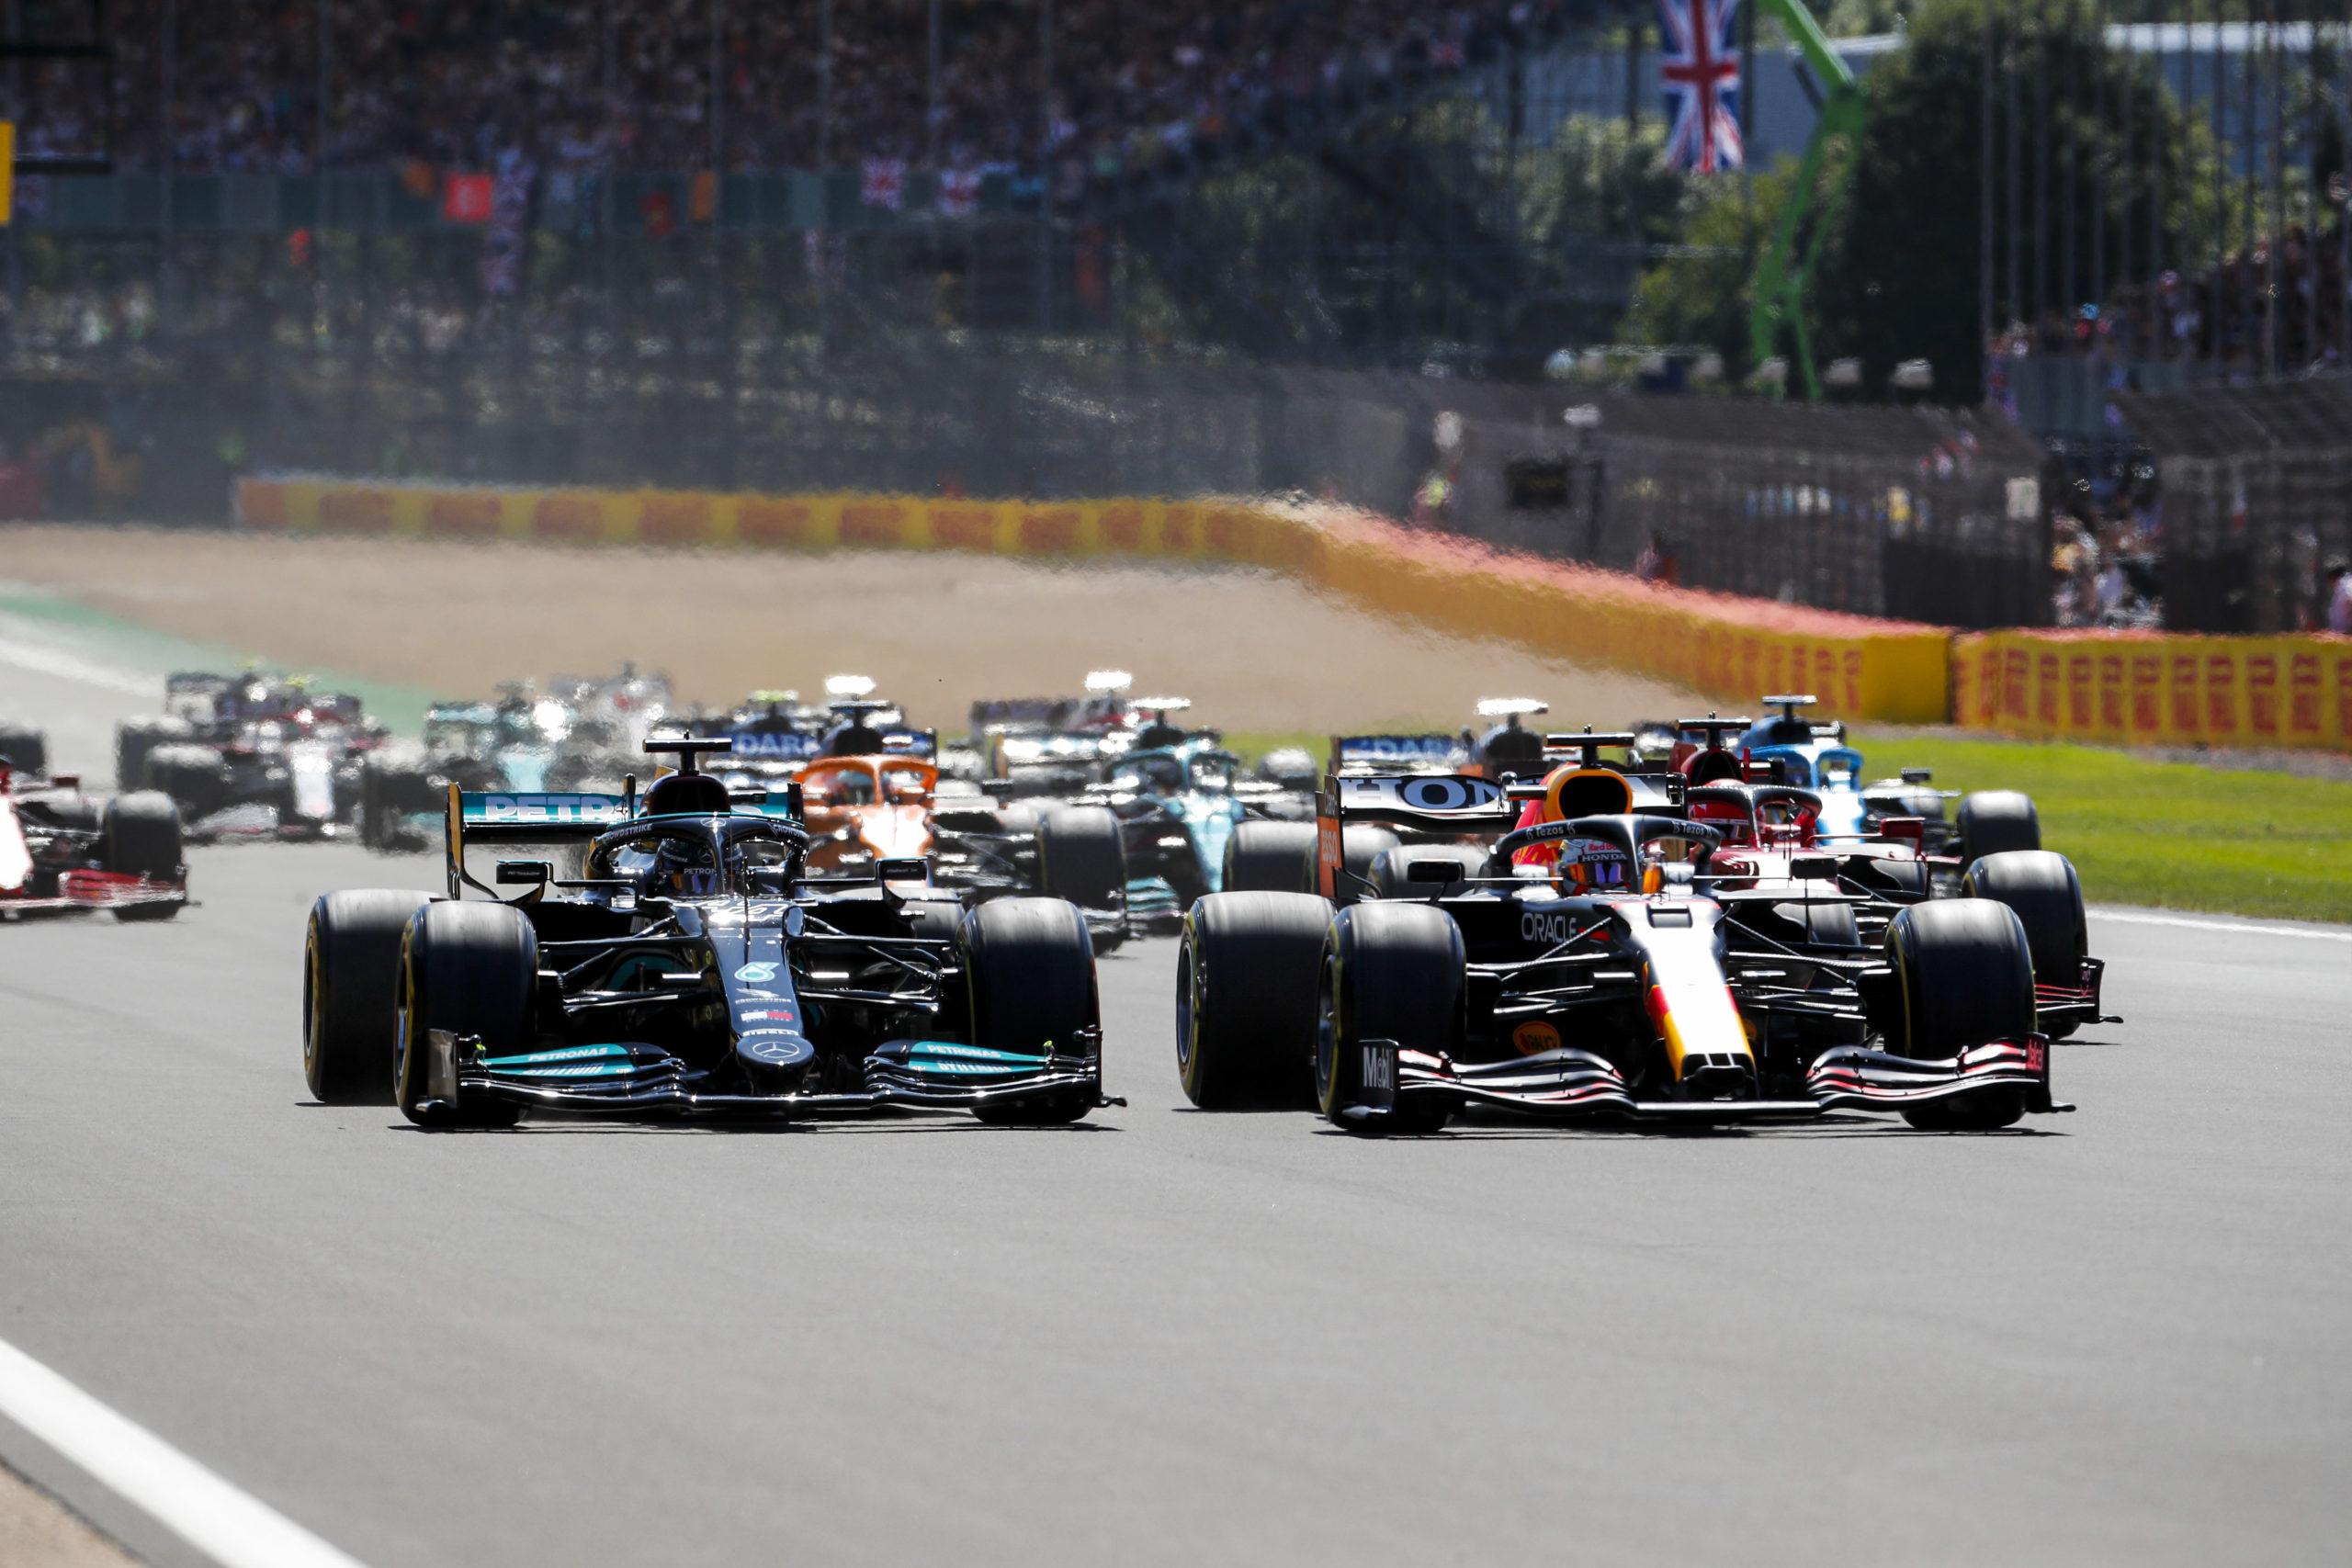 2021 British Grand Prix, Sunday - Lewis Hamilton & Max Verstappen (image courtesy Pirelli)